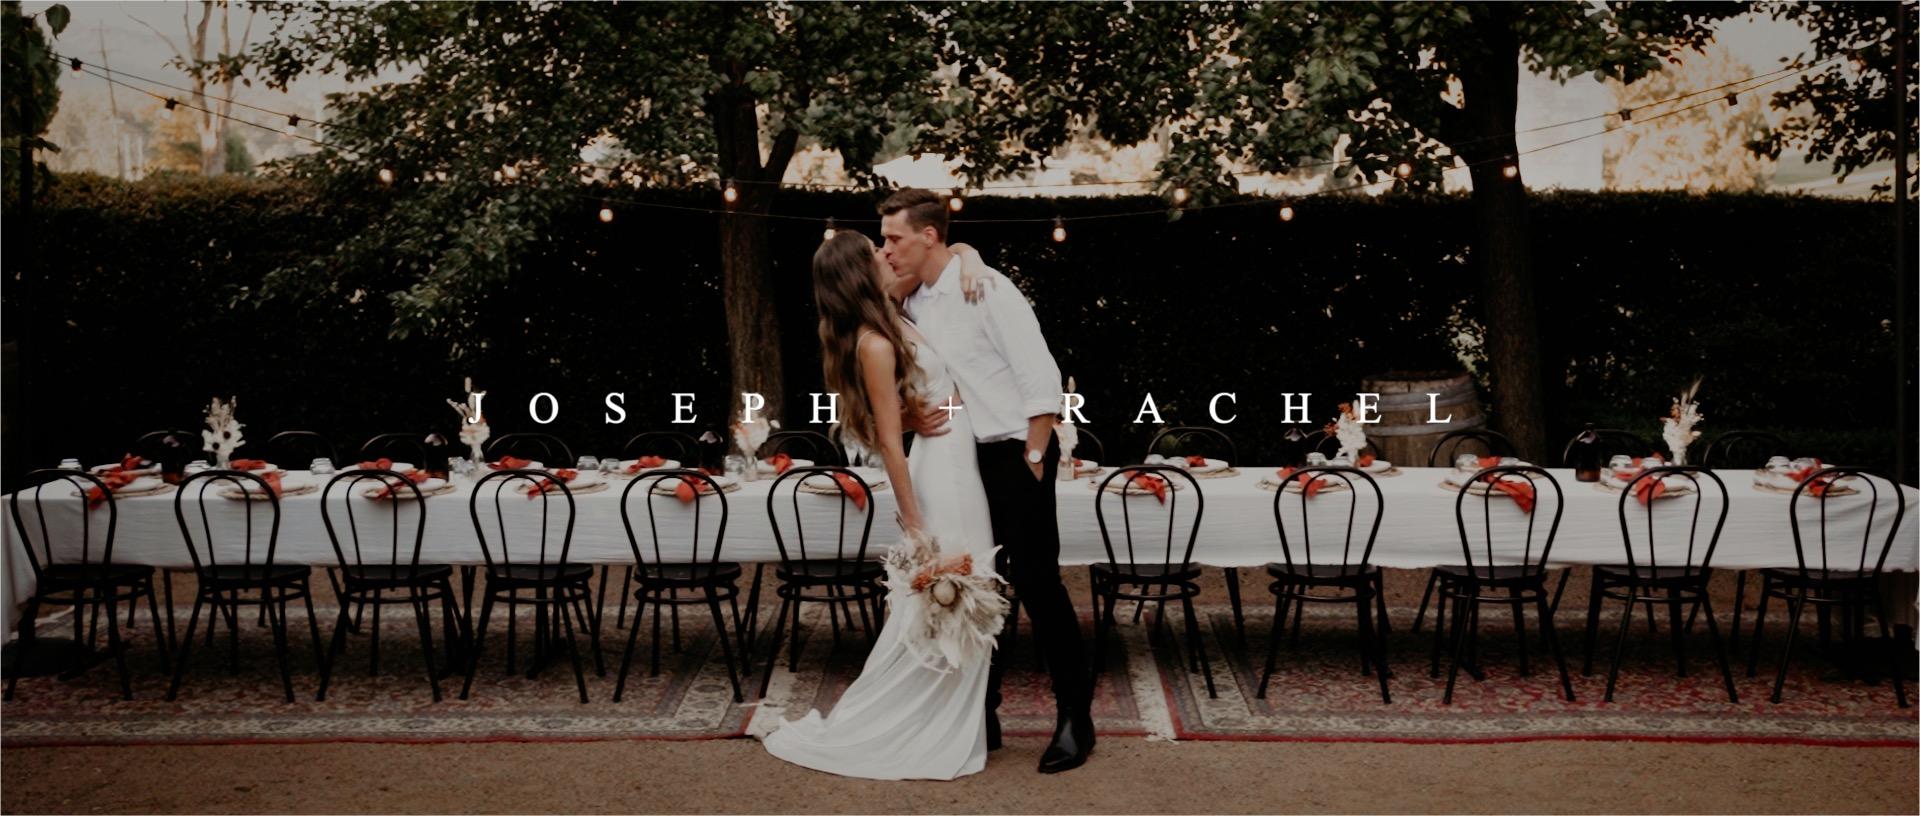 Joseph + Rachel | Berry, Australia | Private Farm